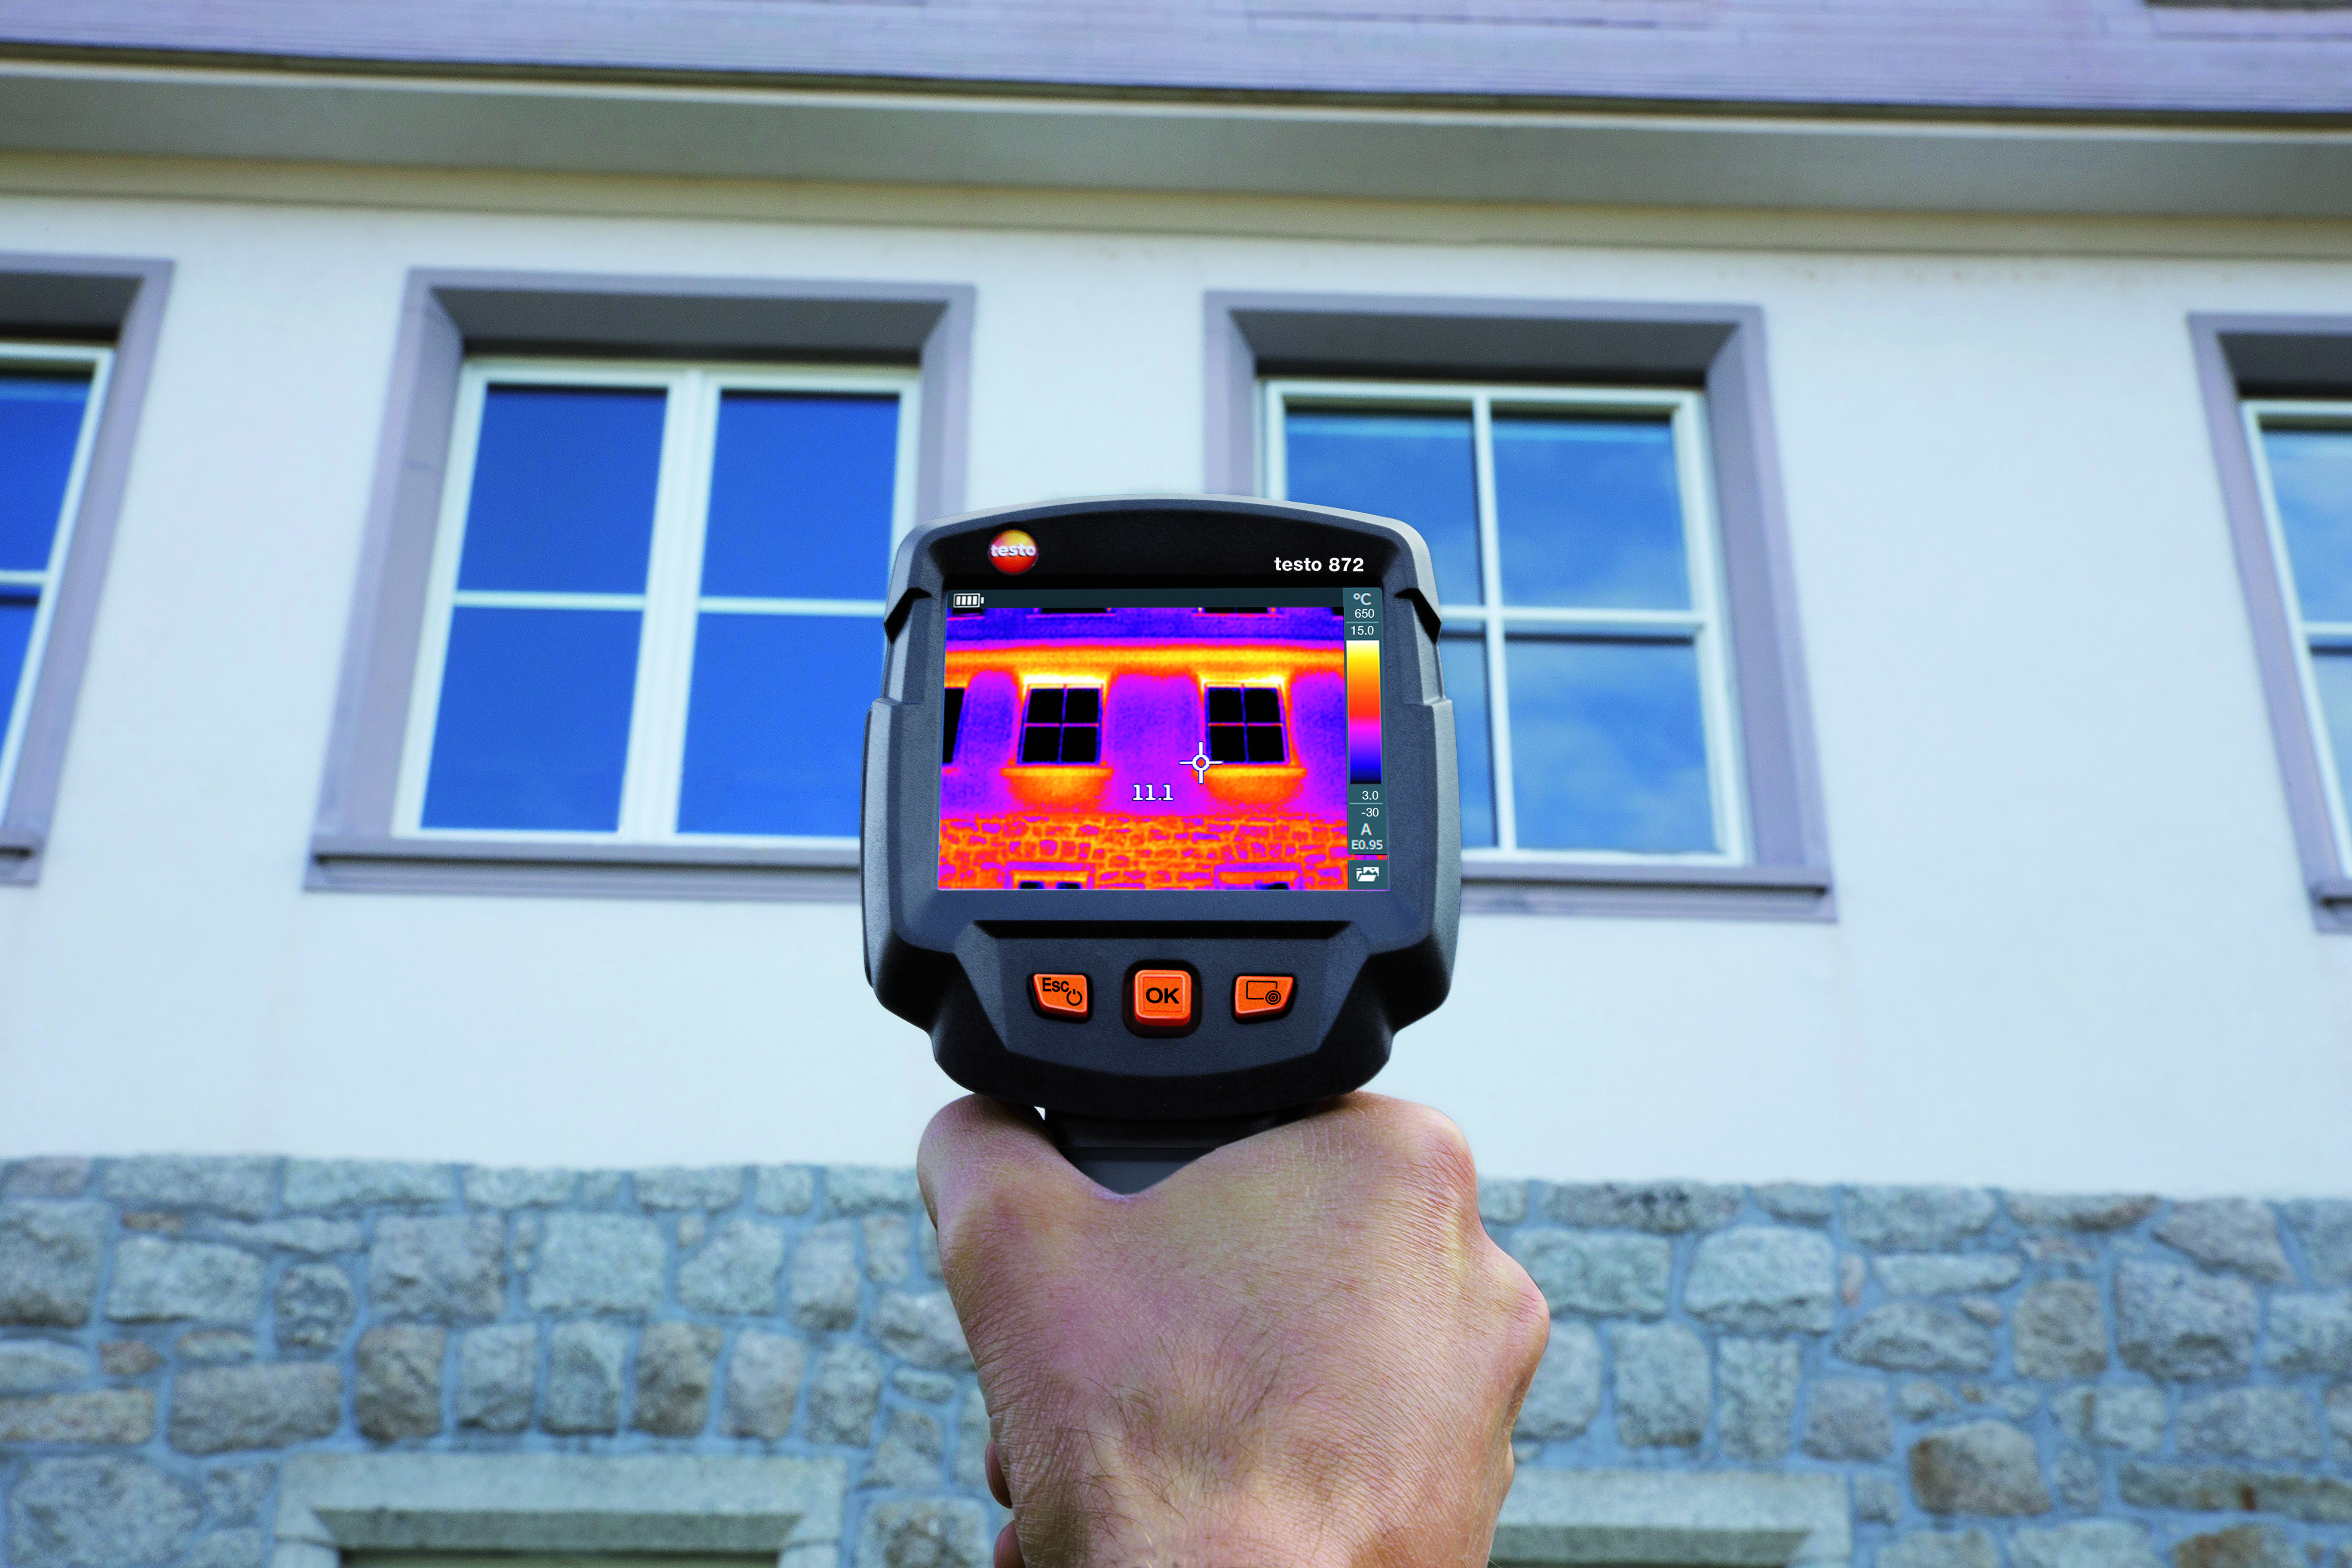 testo 872 Thermal Imaging Camera with App Part No. 0560